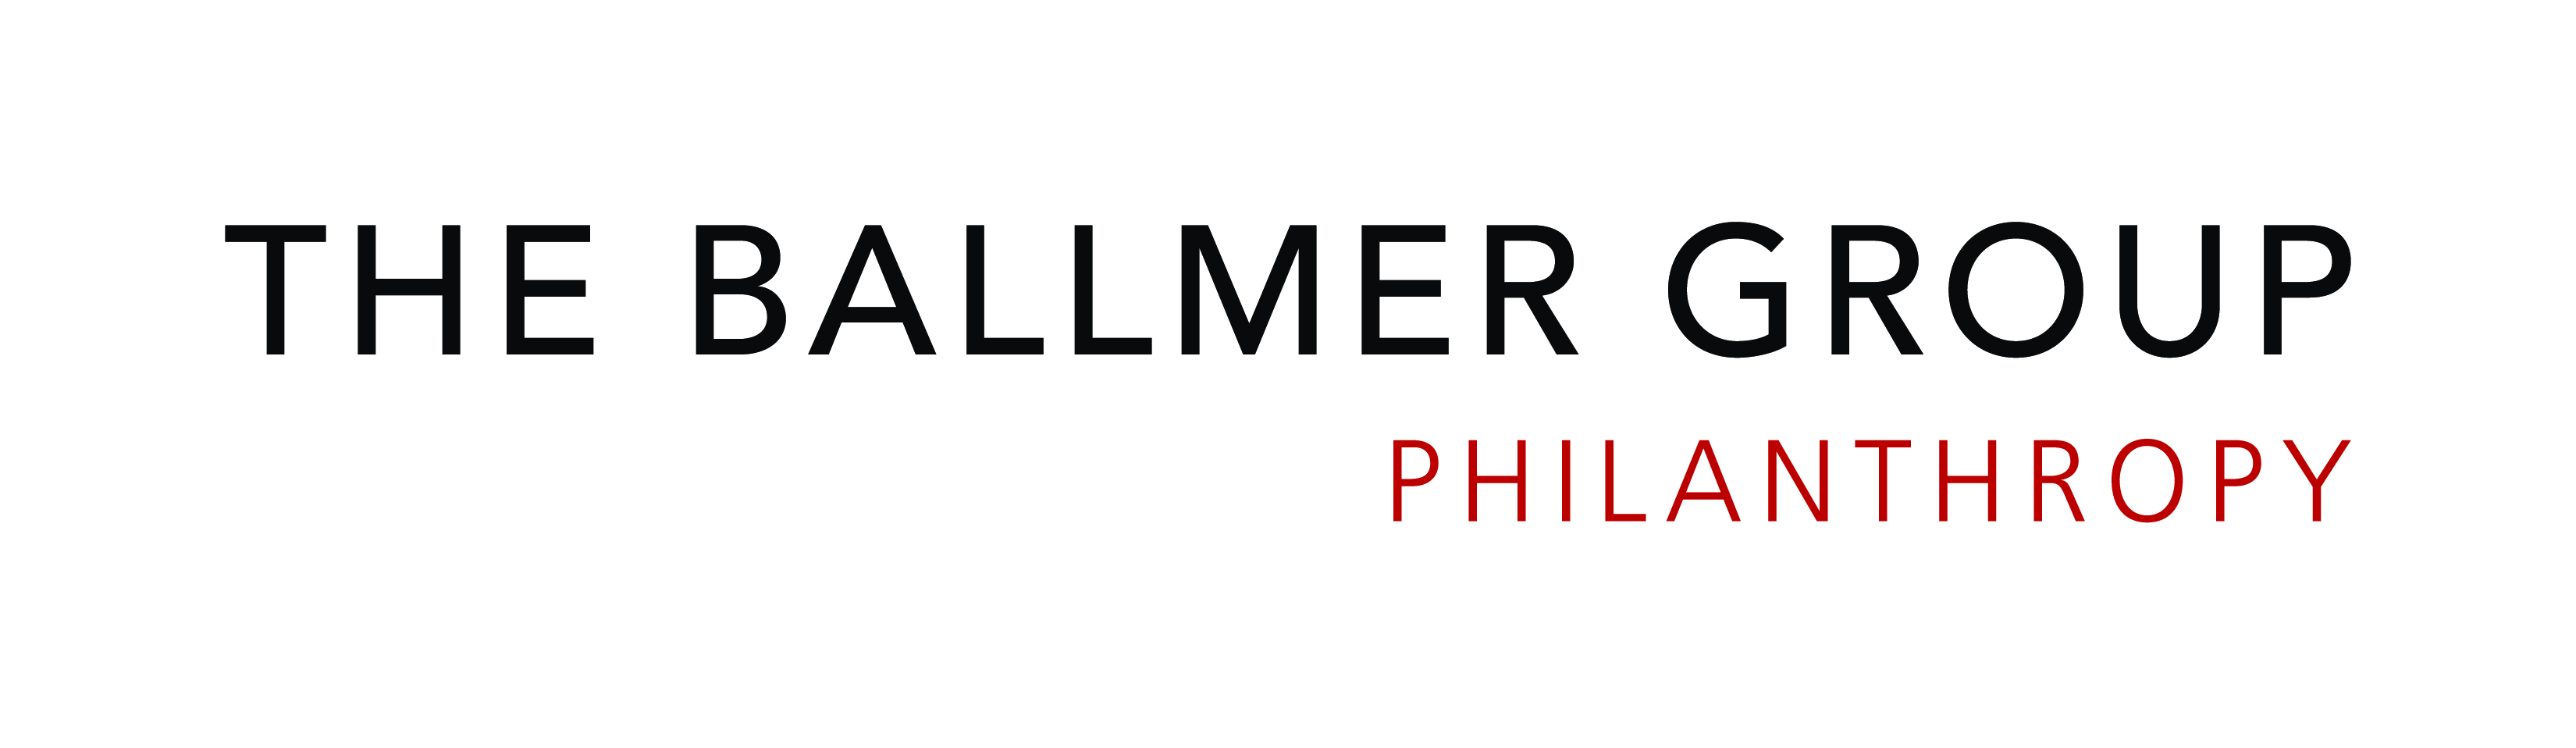 Ballmer Group Philanthropy